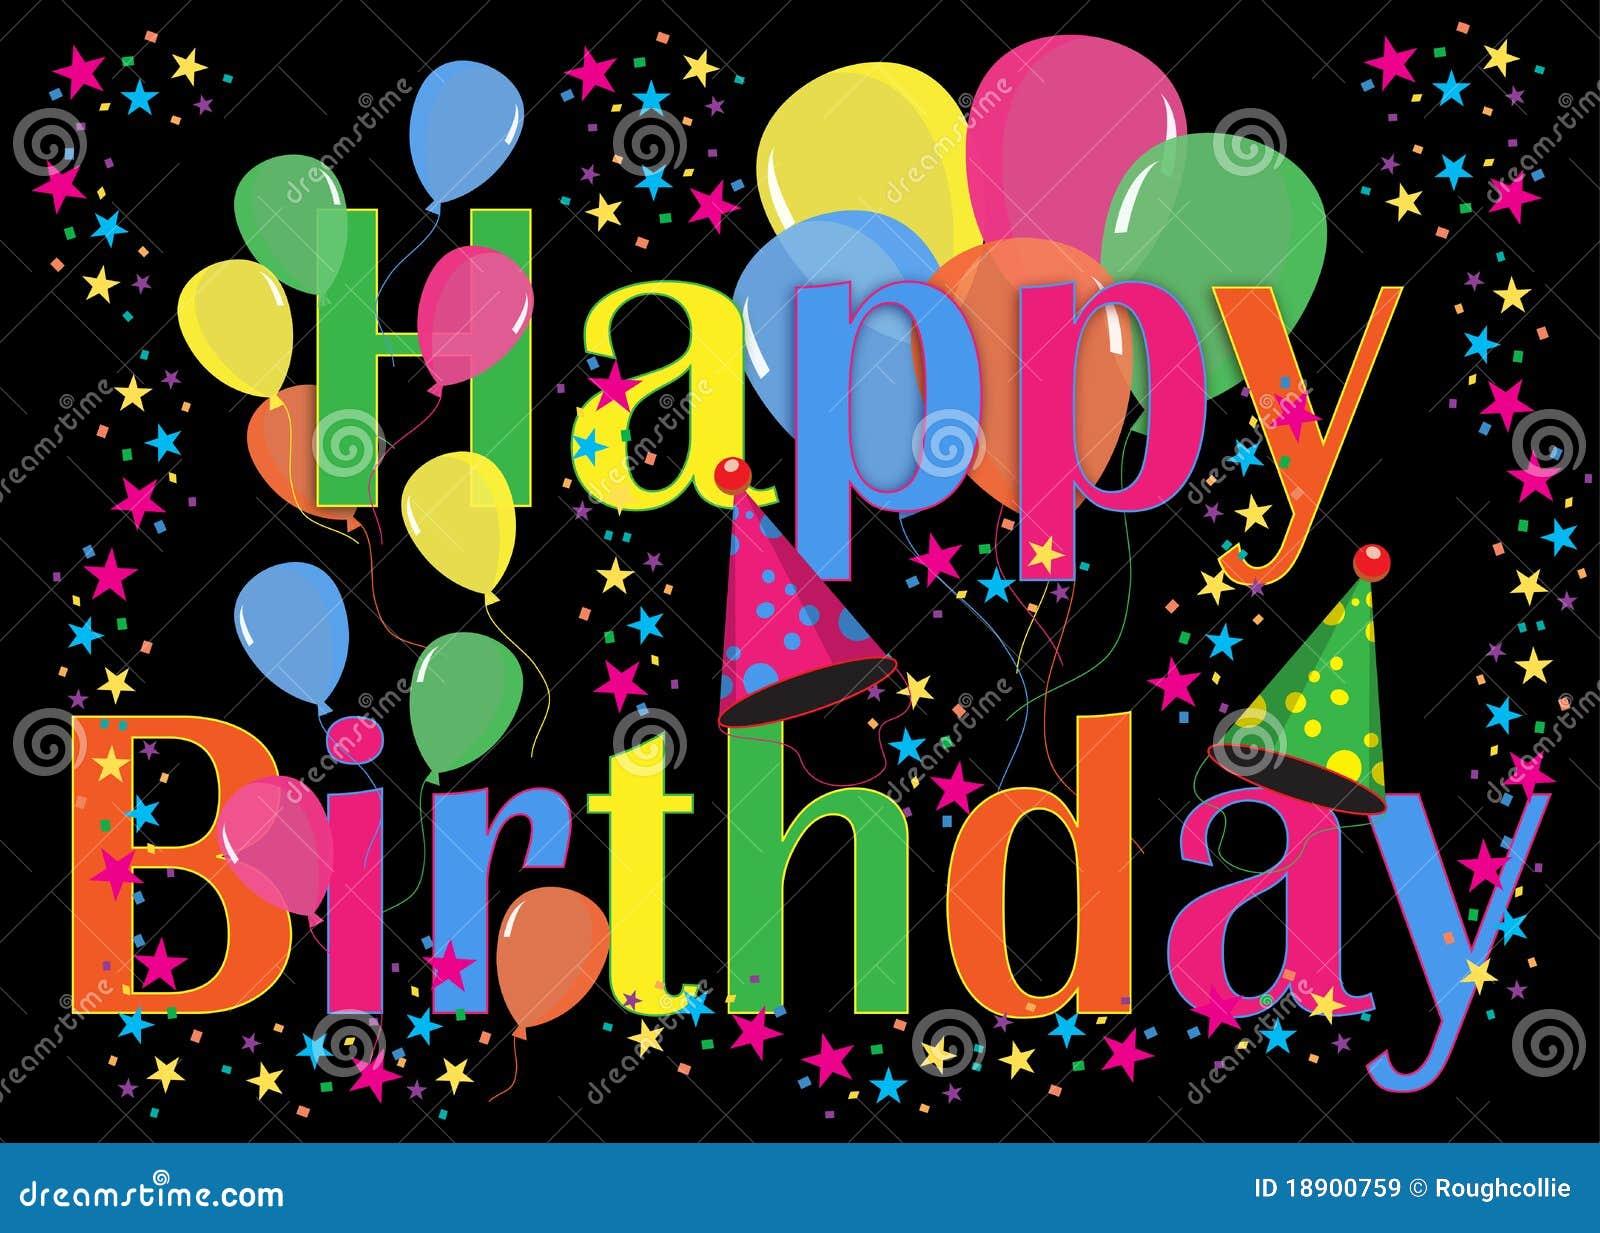 Birthday Balloons Party Background Royalty Free Illustration